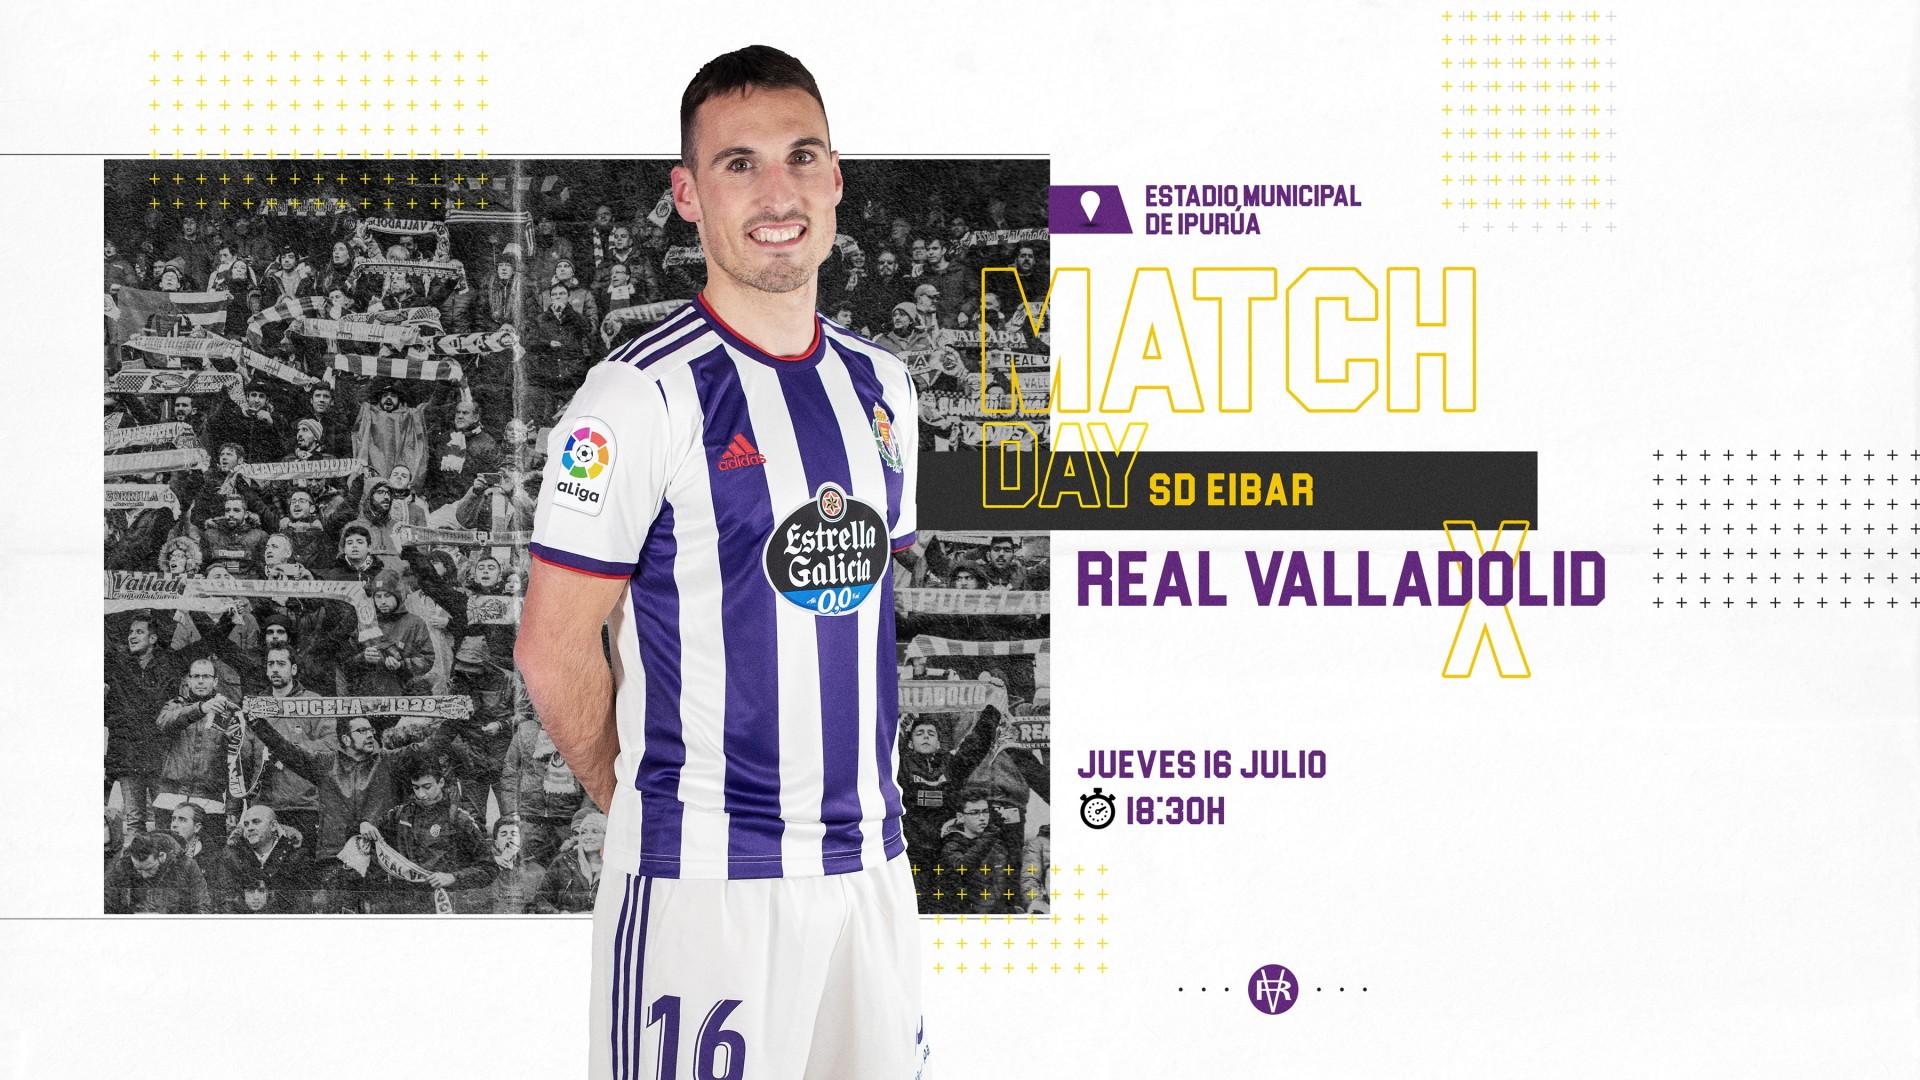 S.D. Eibar - Real Valladolid C.F. Jueves 16 de Junio. 18:30 Match-San-Eme